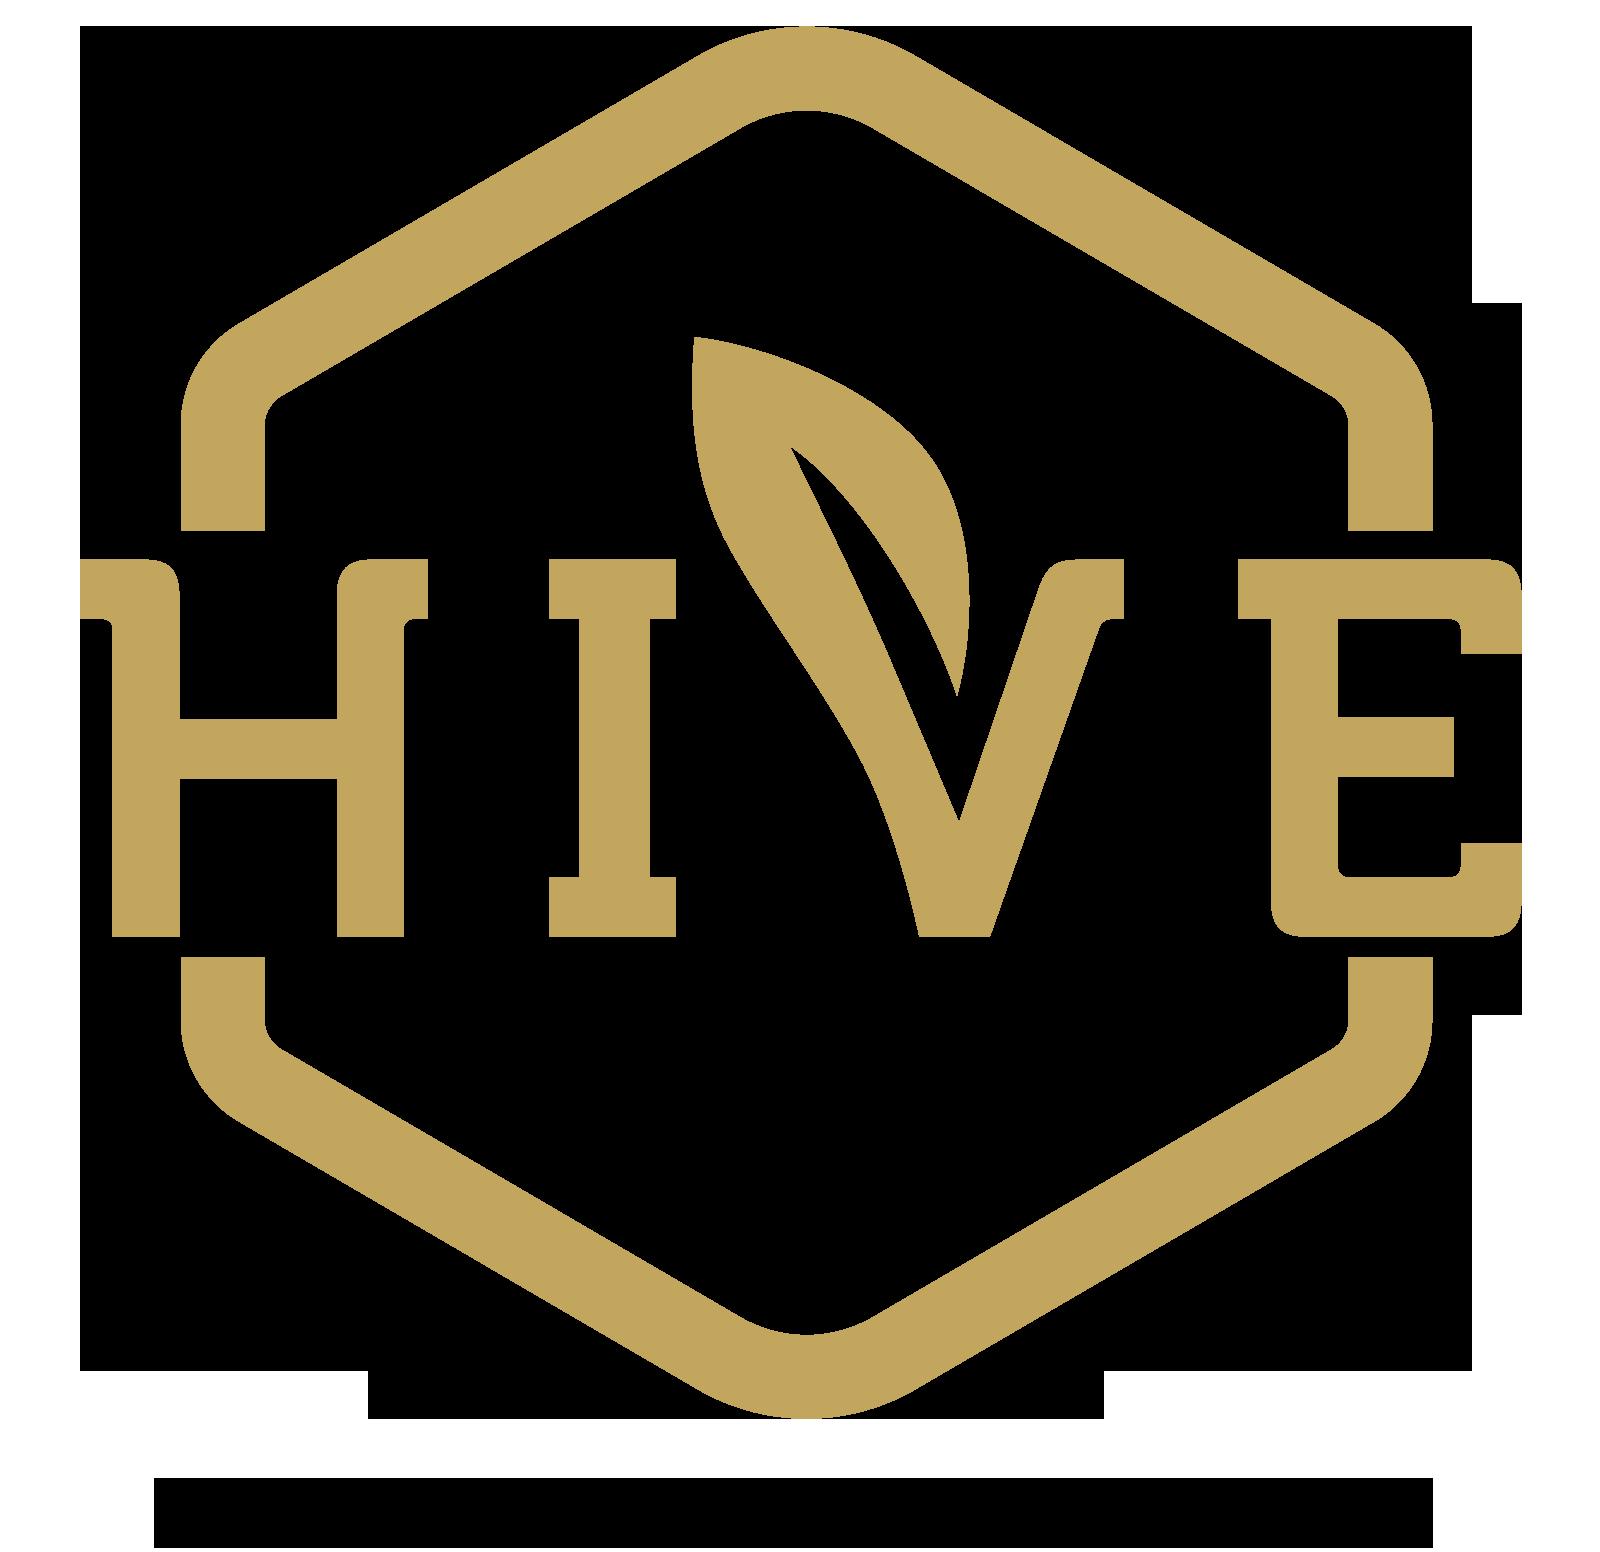 Hive-Vector-black.png